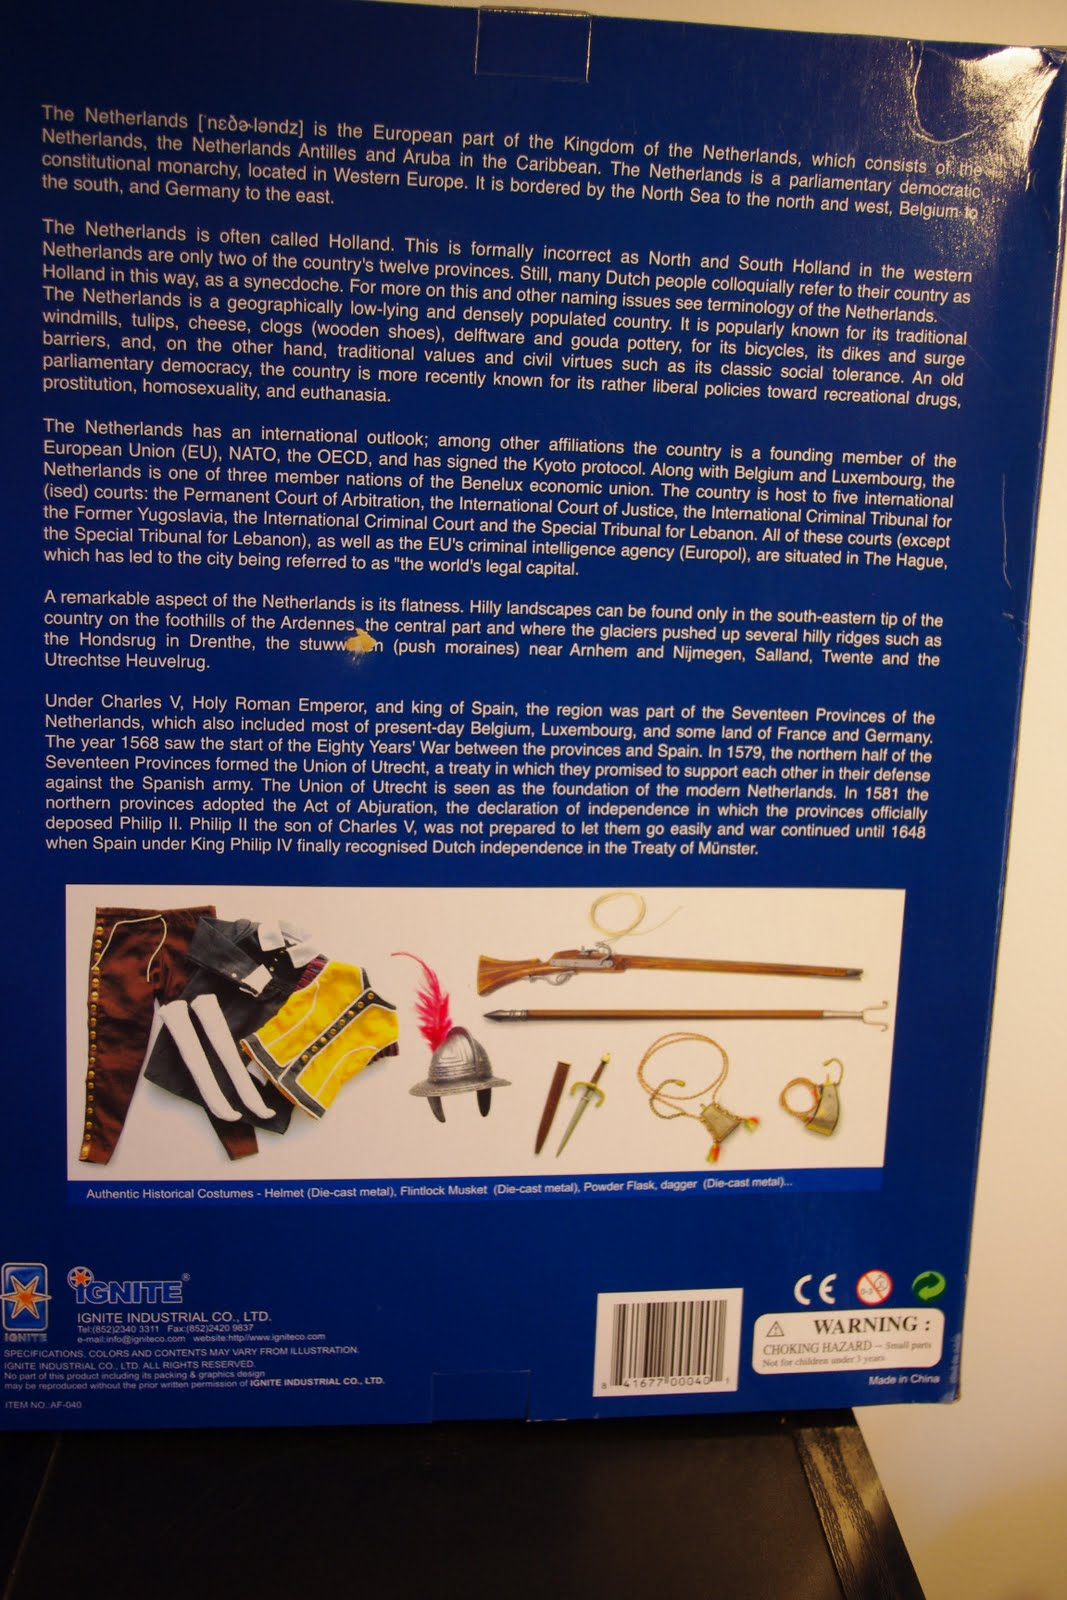 Na Boca Do Lobo: Knight of Outremer II, figura da Ignite |Riddick Blade Silhouette